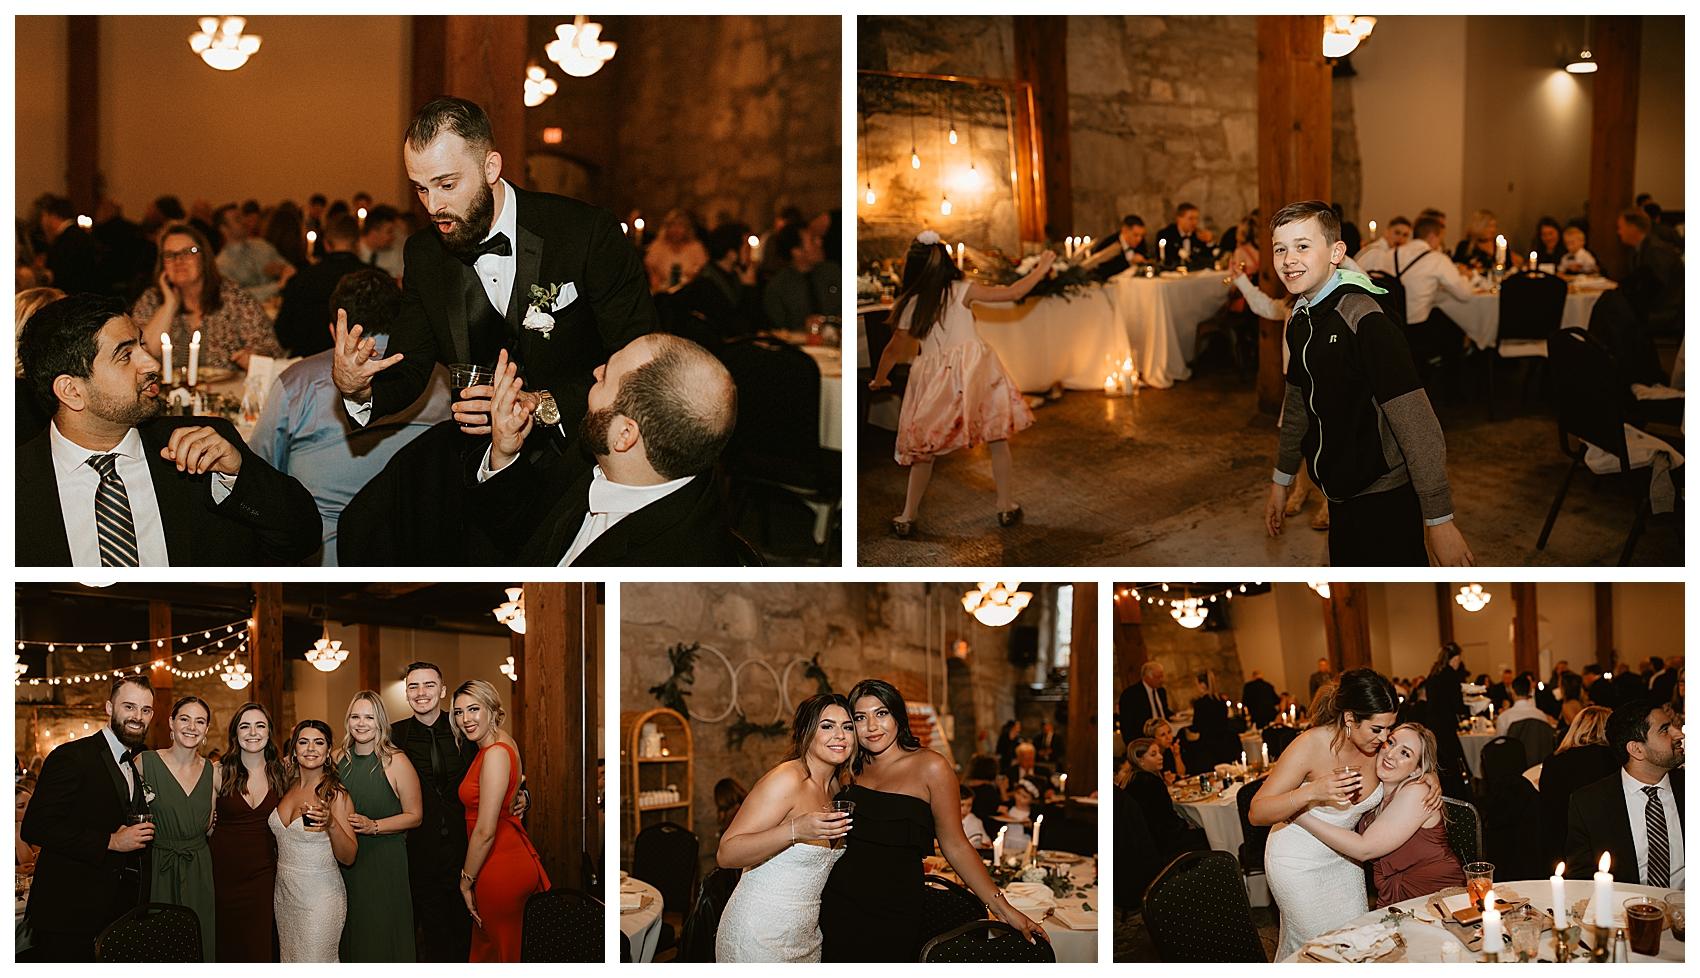 Chateau Rive Spokane Wedding Cassie Trottier Photography01099.jpg